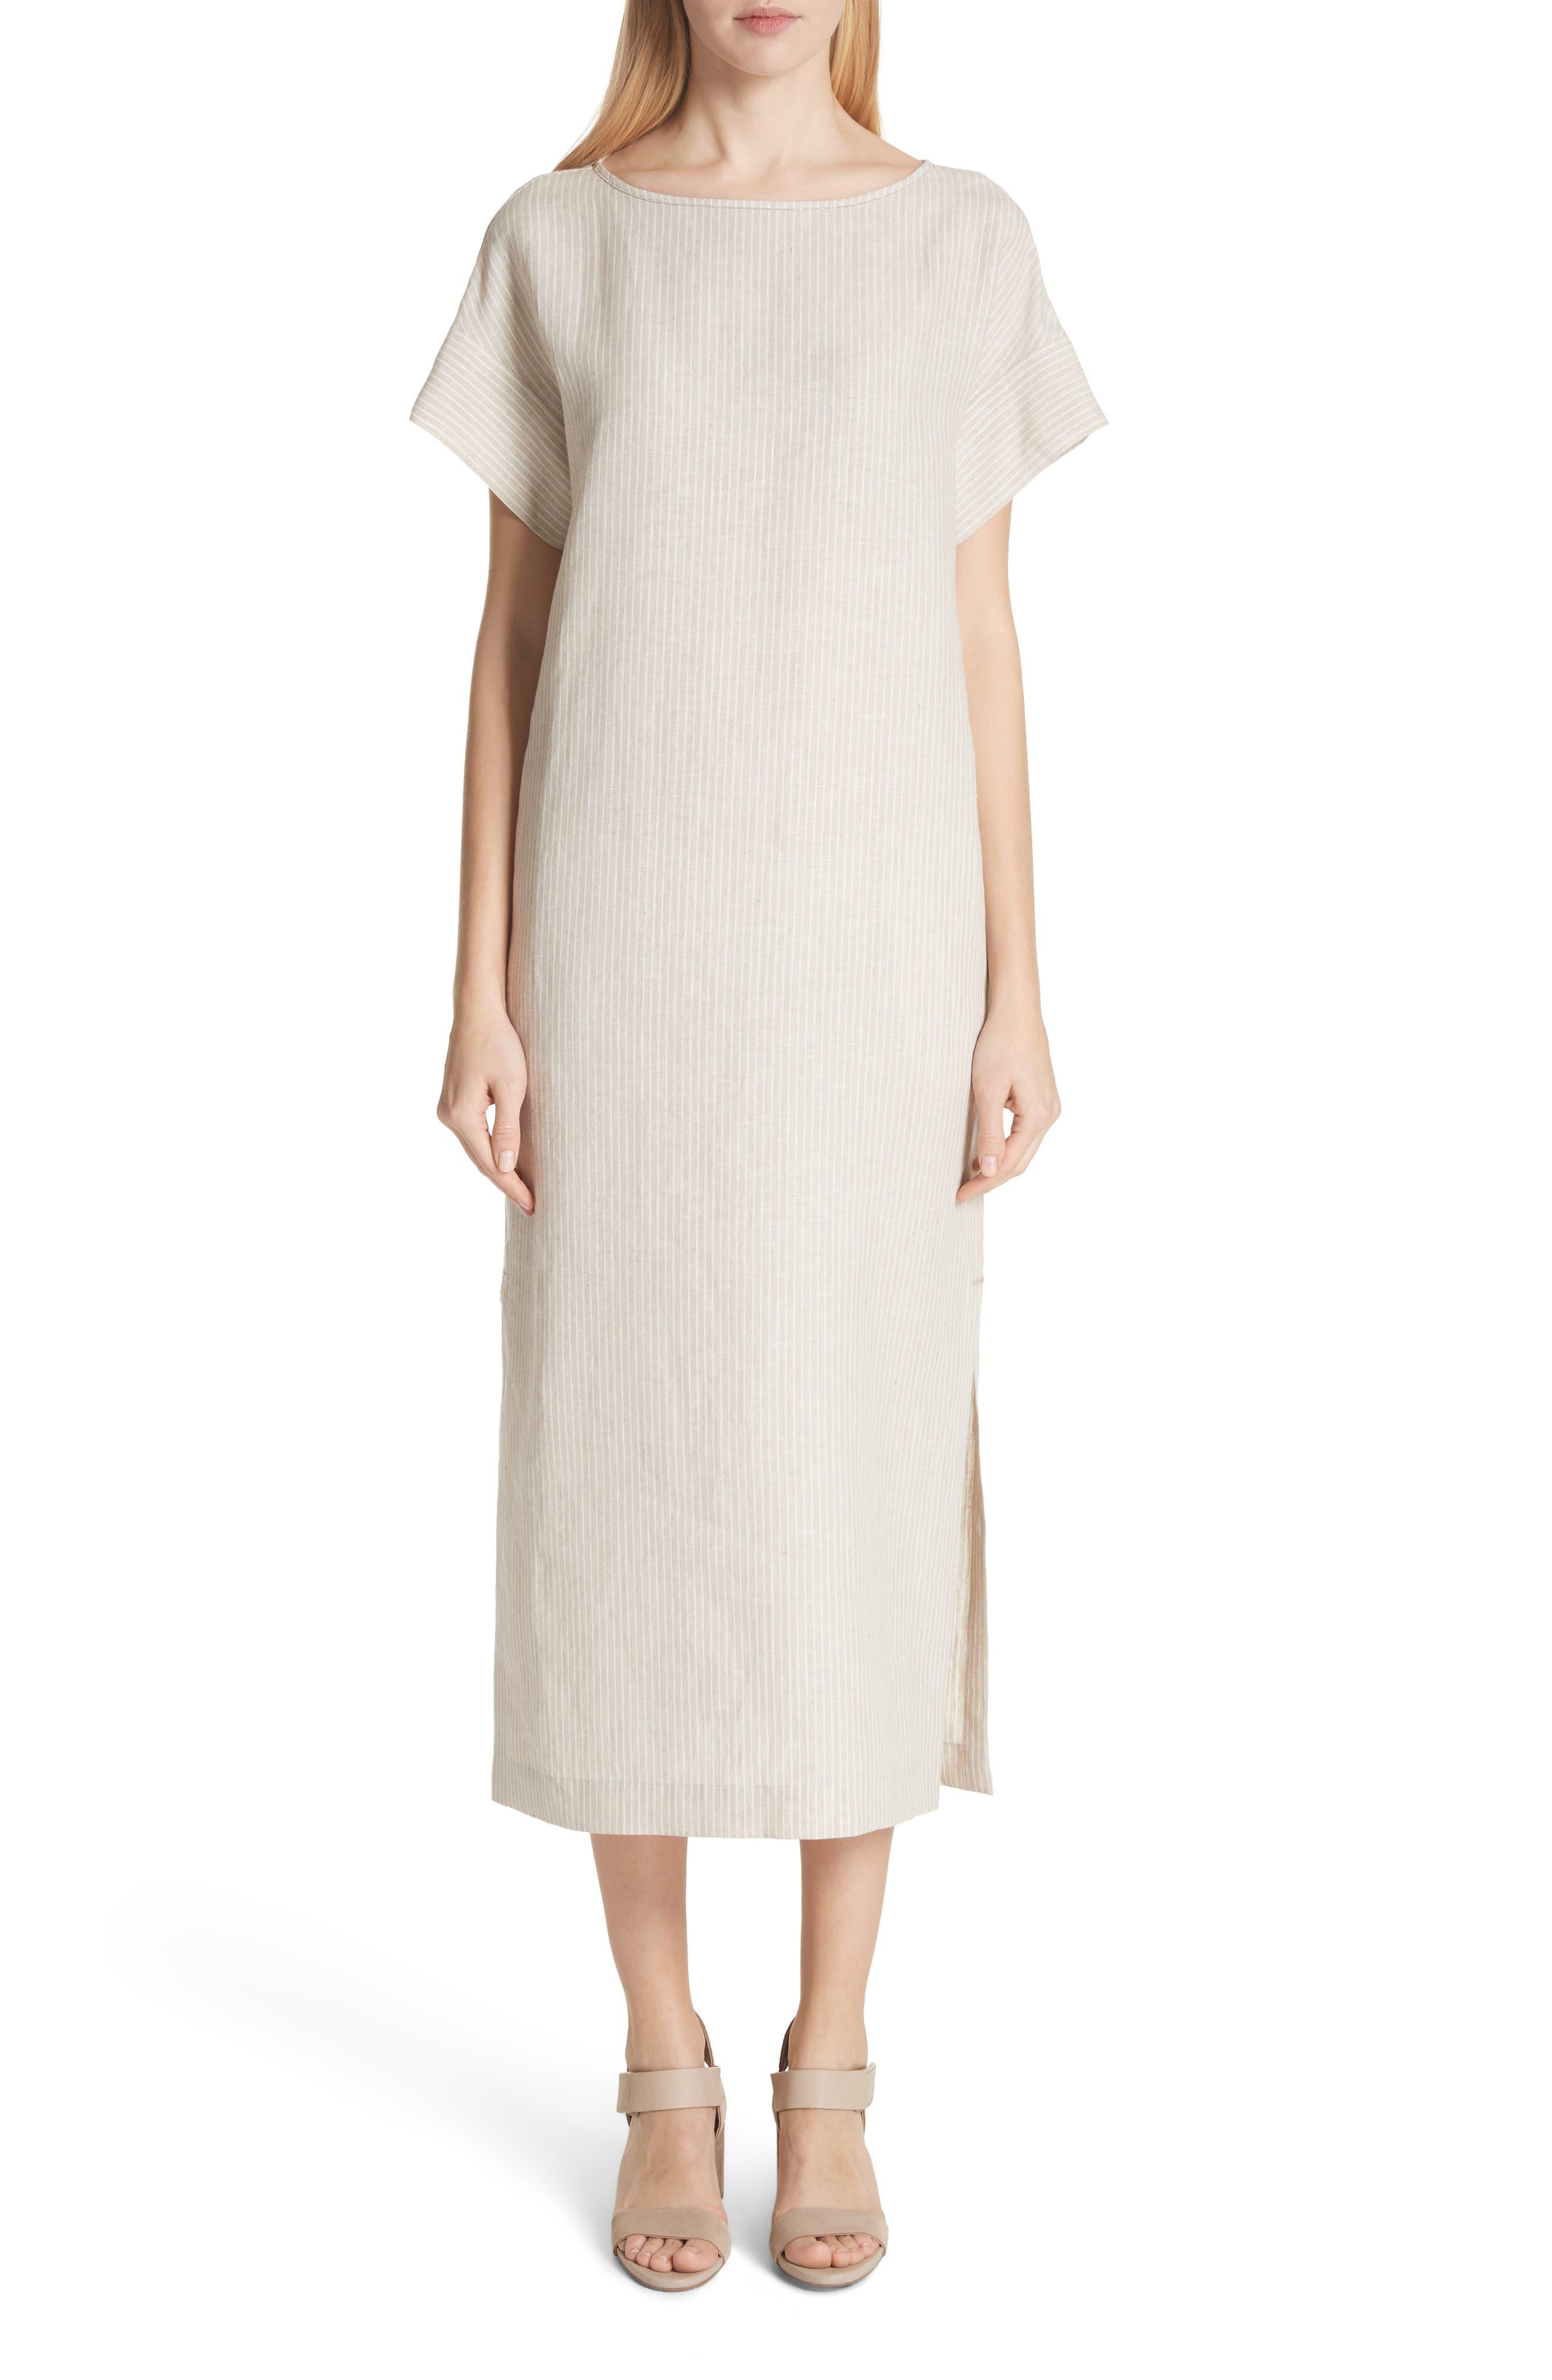 LAFAYETTE 148 NEW YORK Emiline Stripe Linen Dress, Main, color, 251